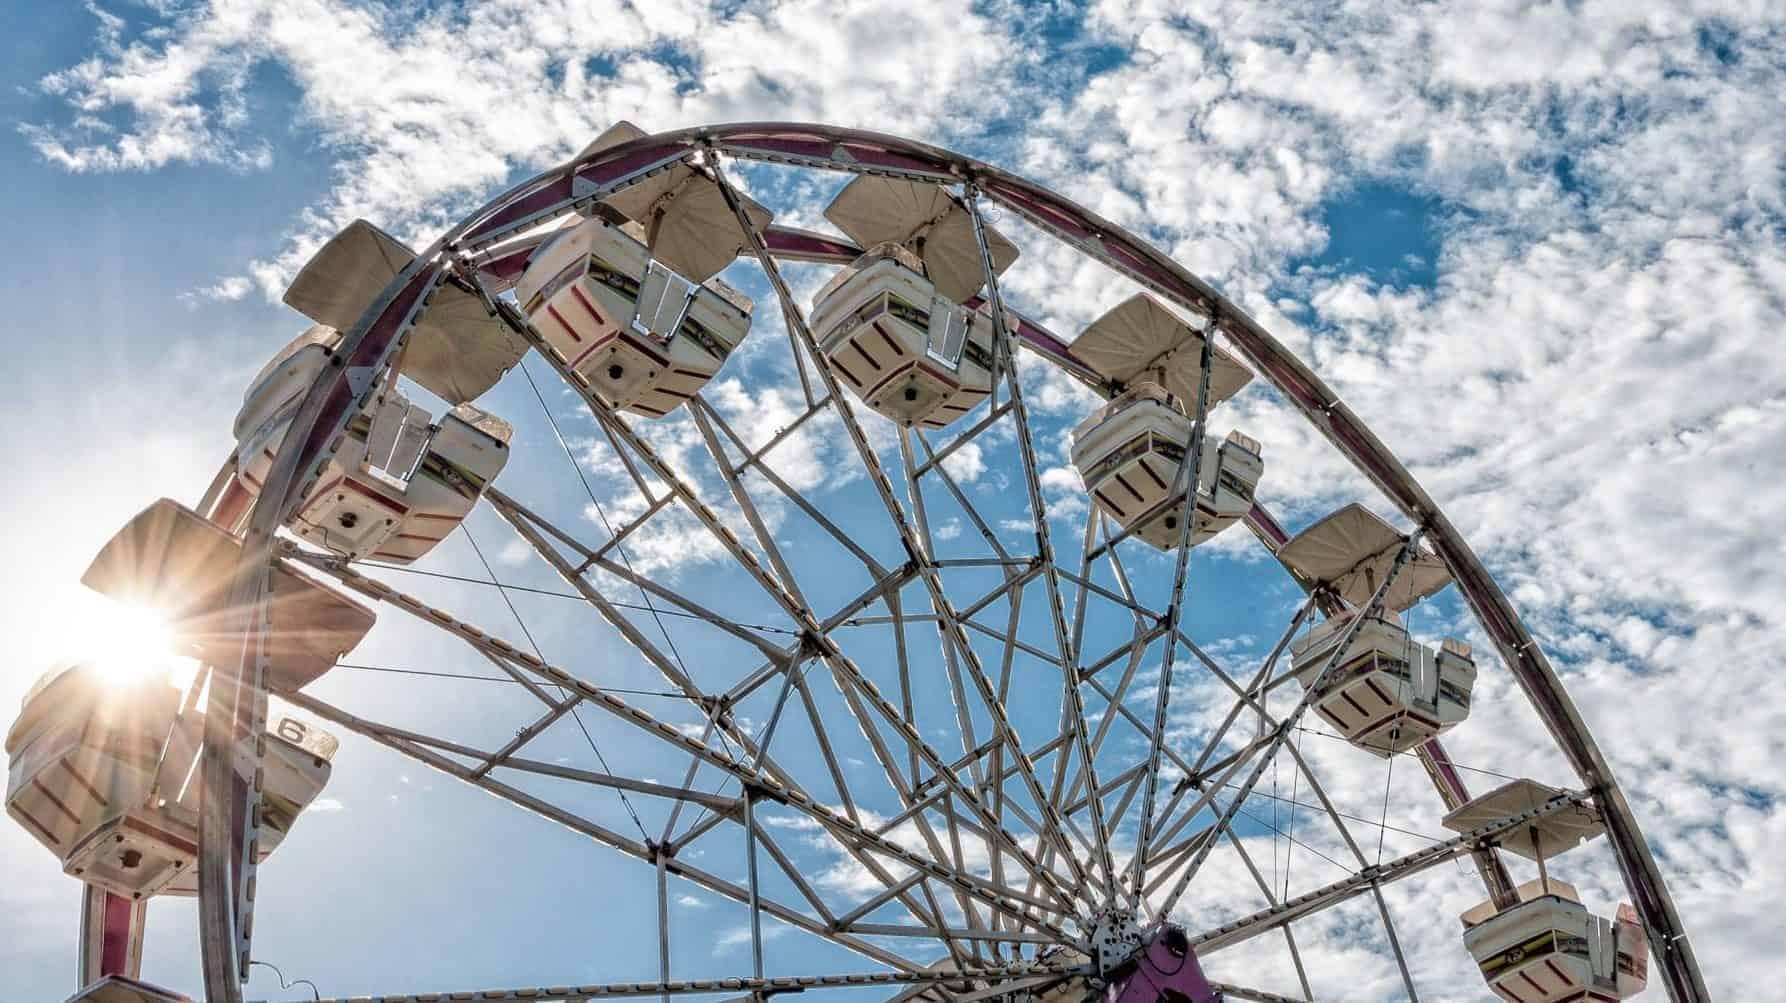 Napa County Fairgrounds